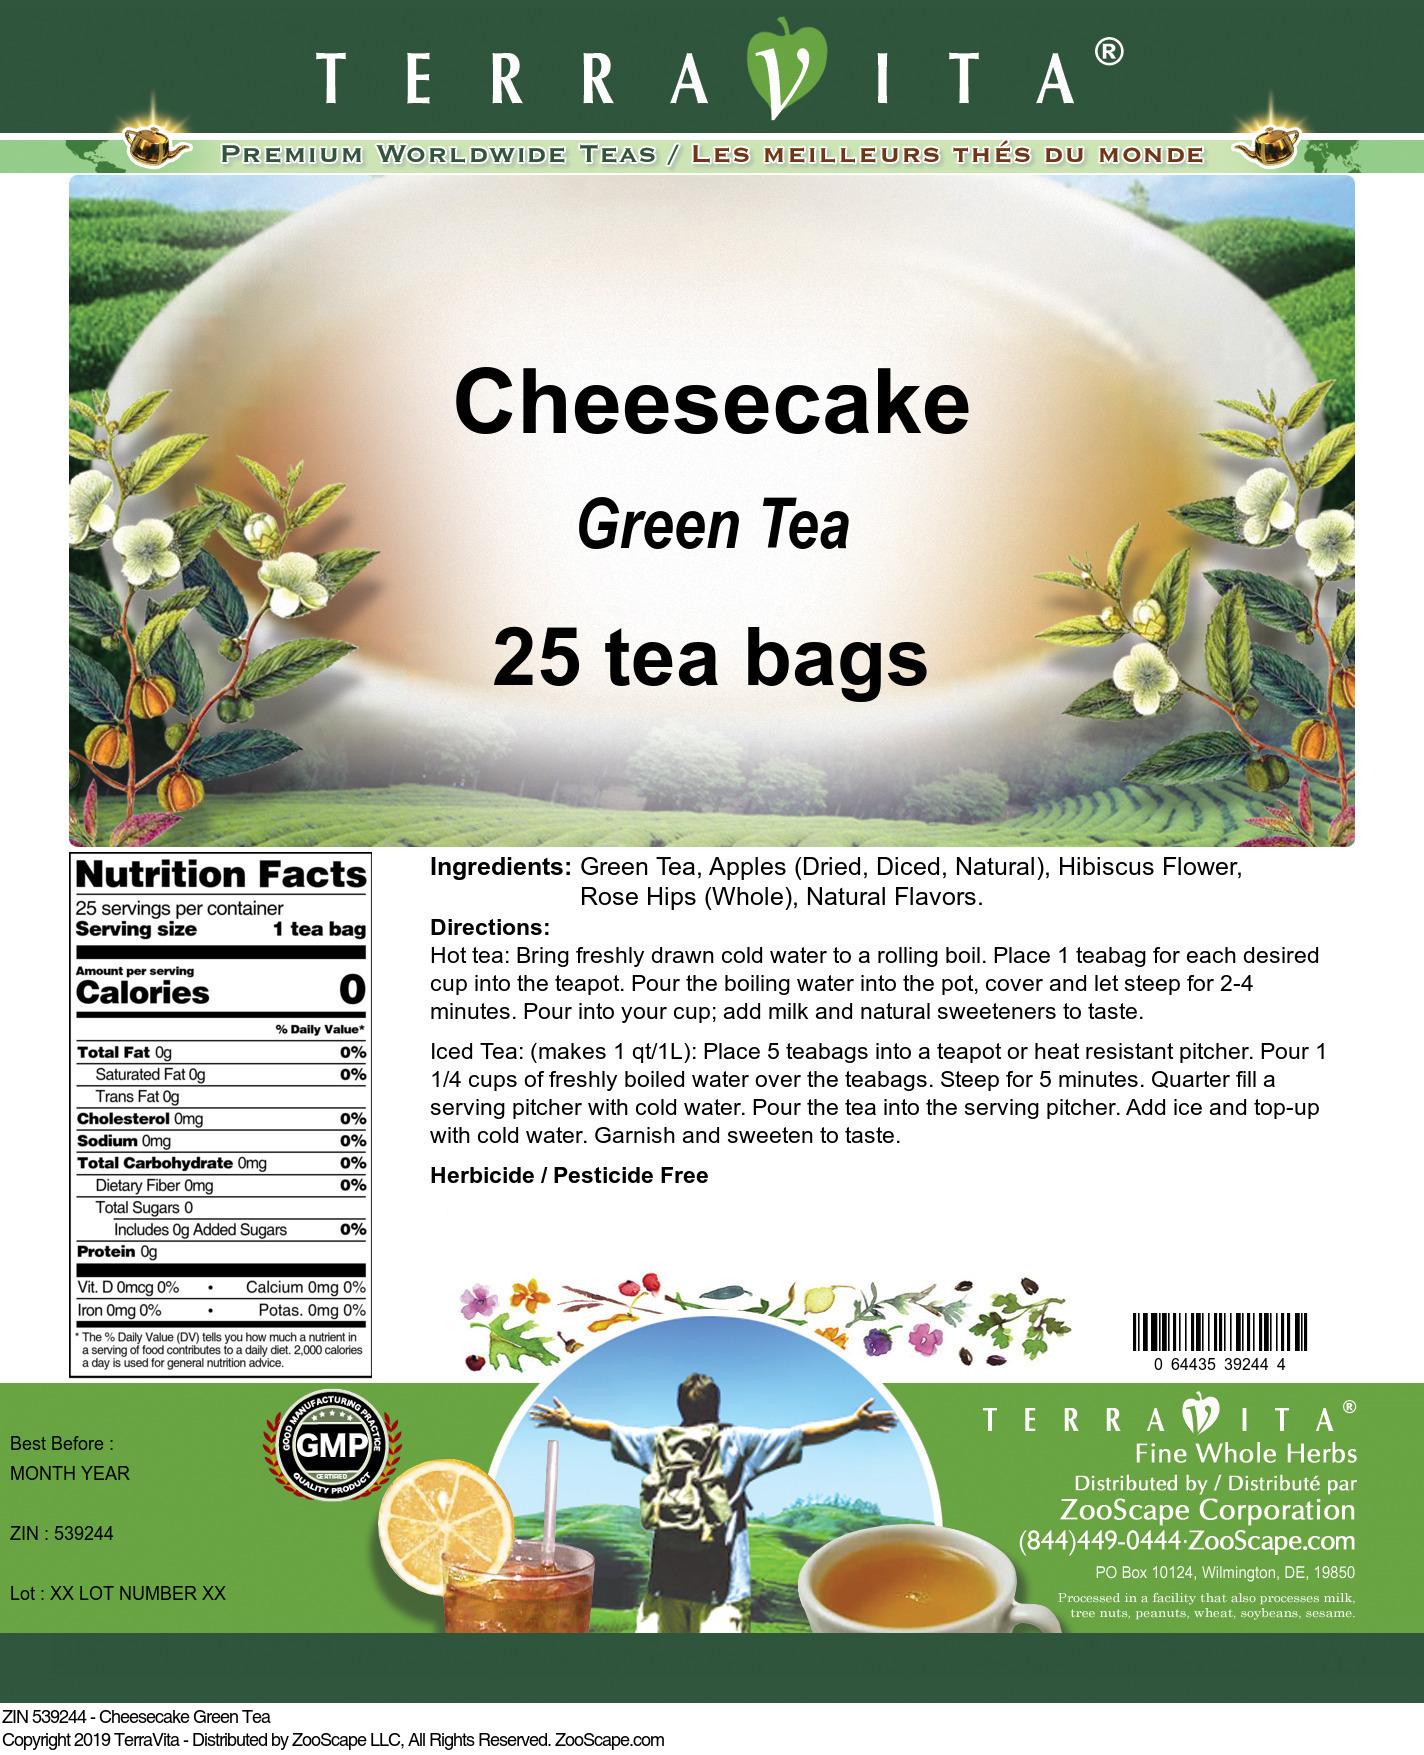 Cheesecake Green Tea